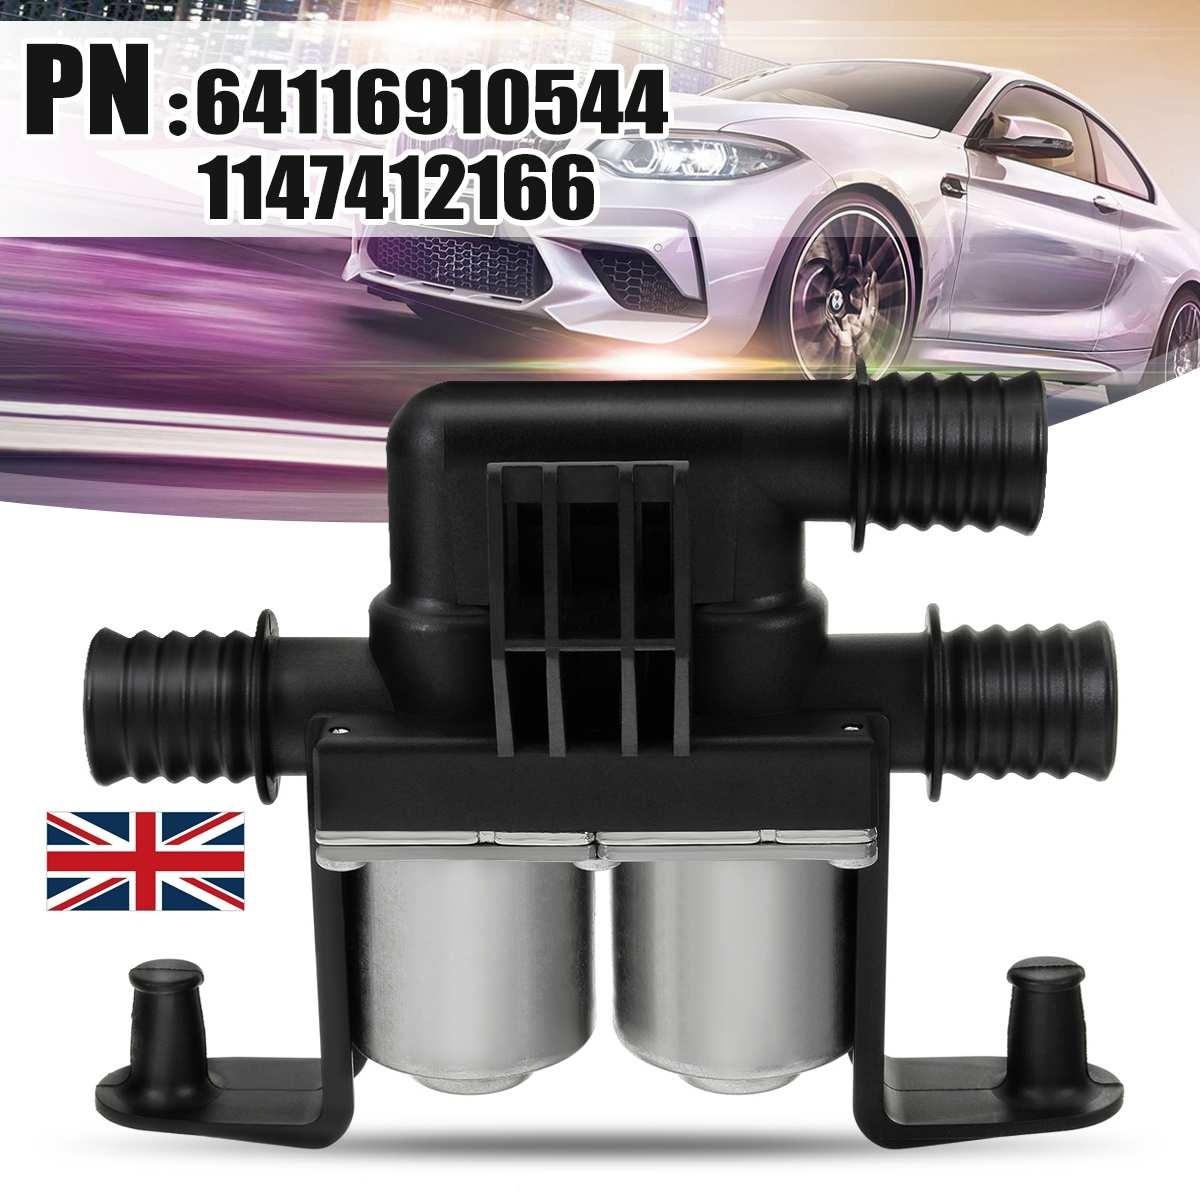 Car Heater Control Valve Solenoid Valve Cooling Water Valve for BMW E70 X5 E53 E71 X6 2003-2017 64116910544 1147412166